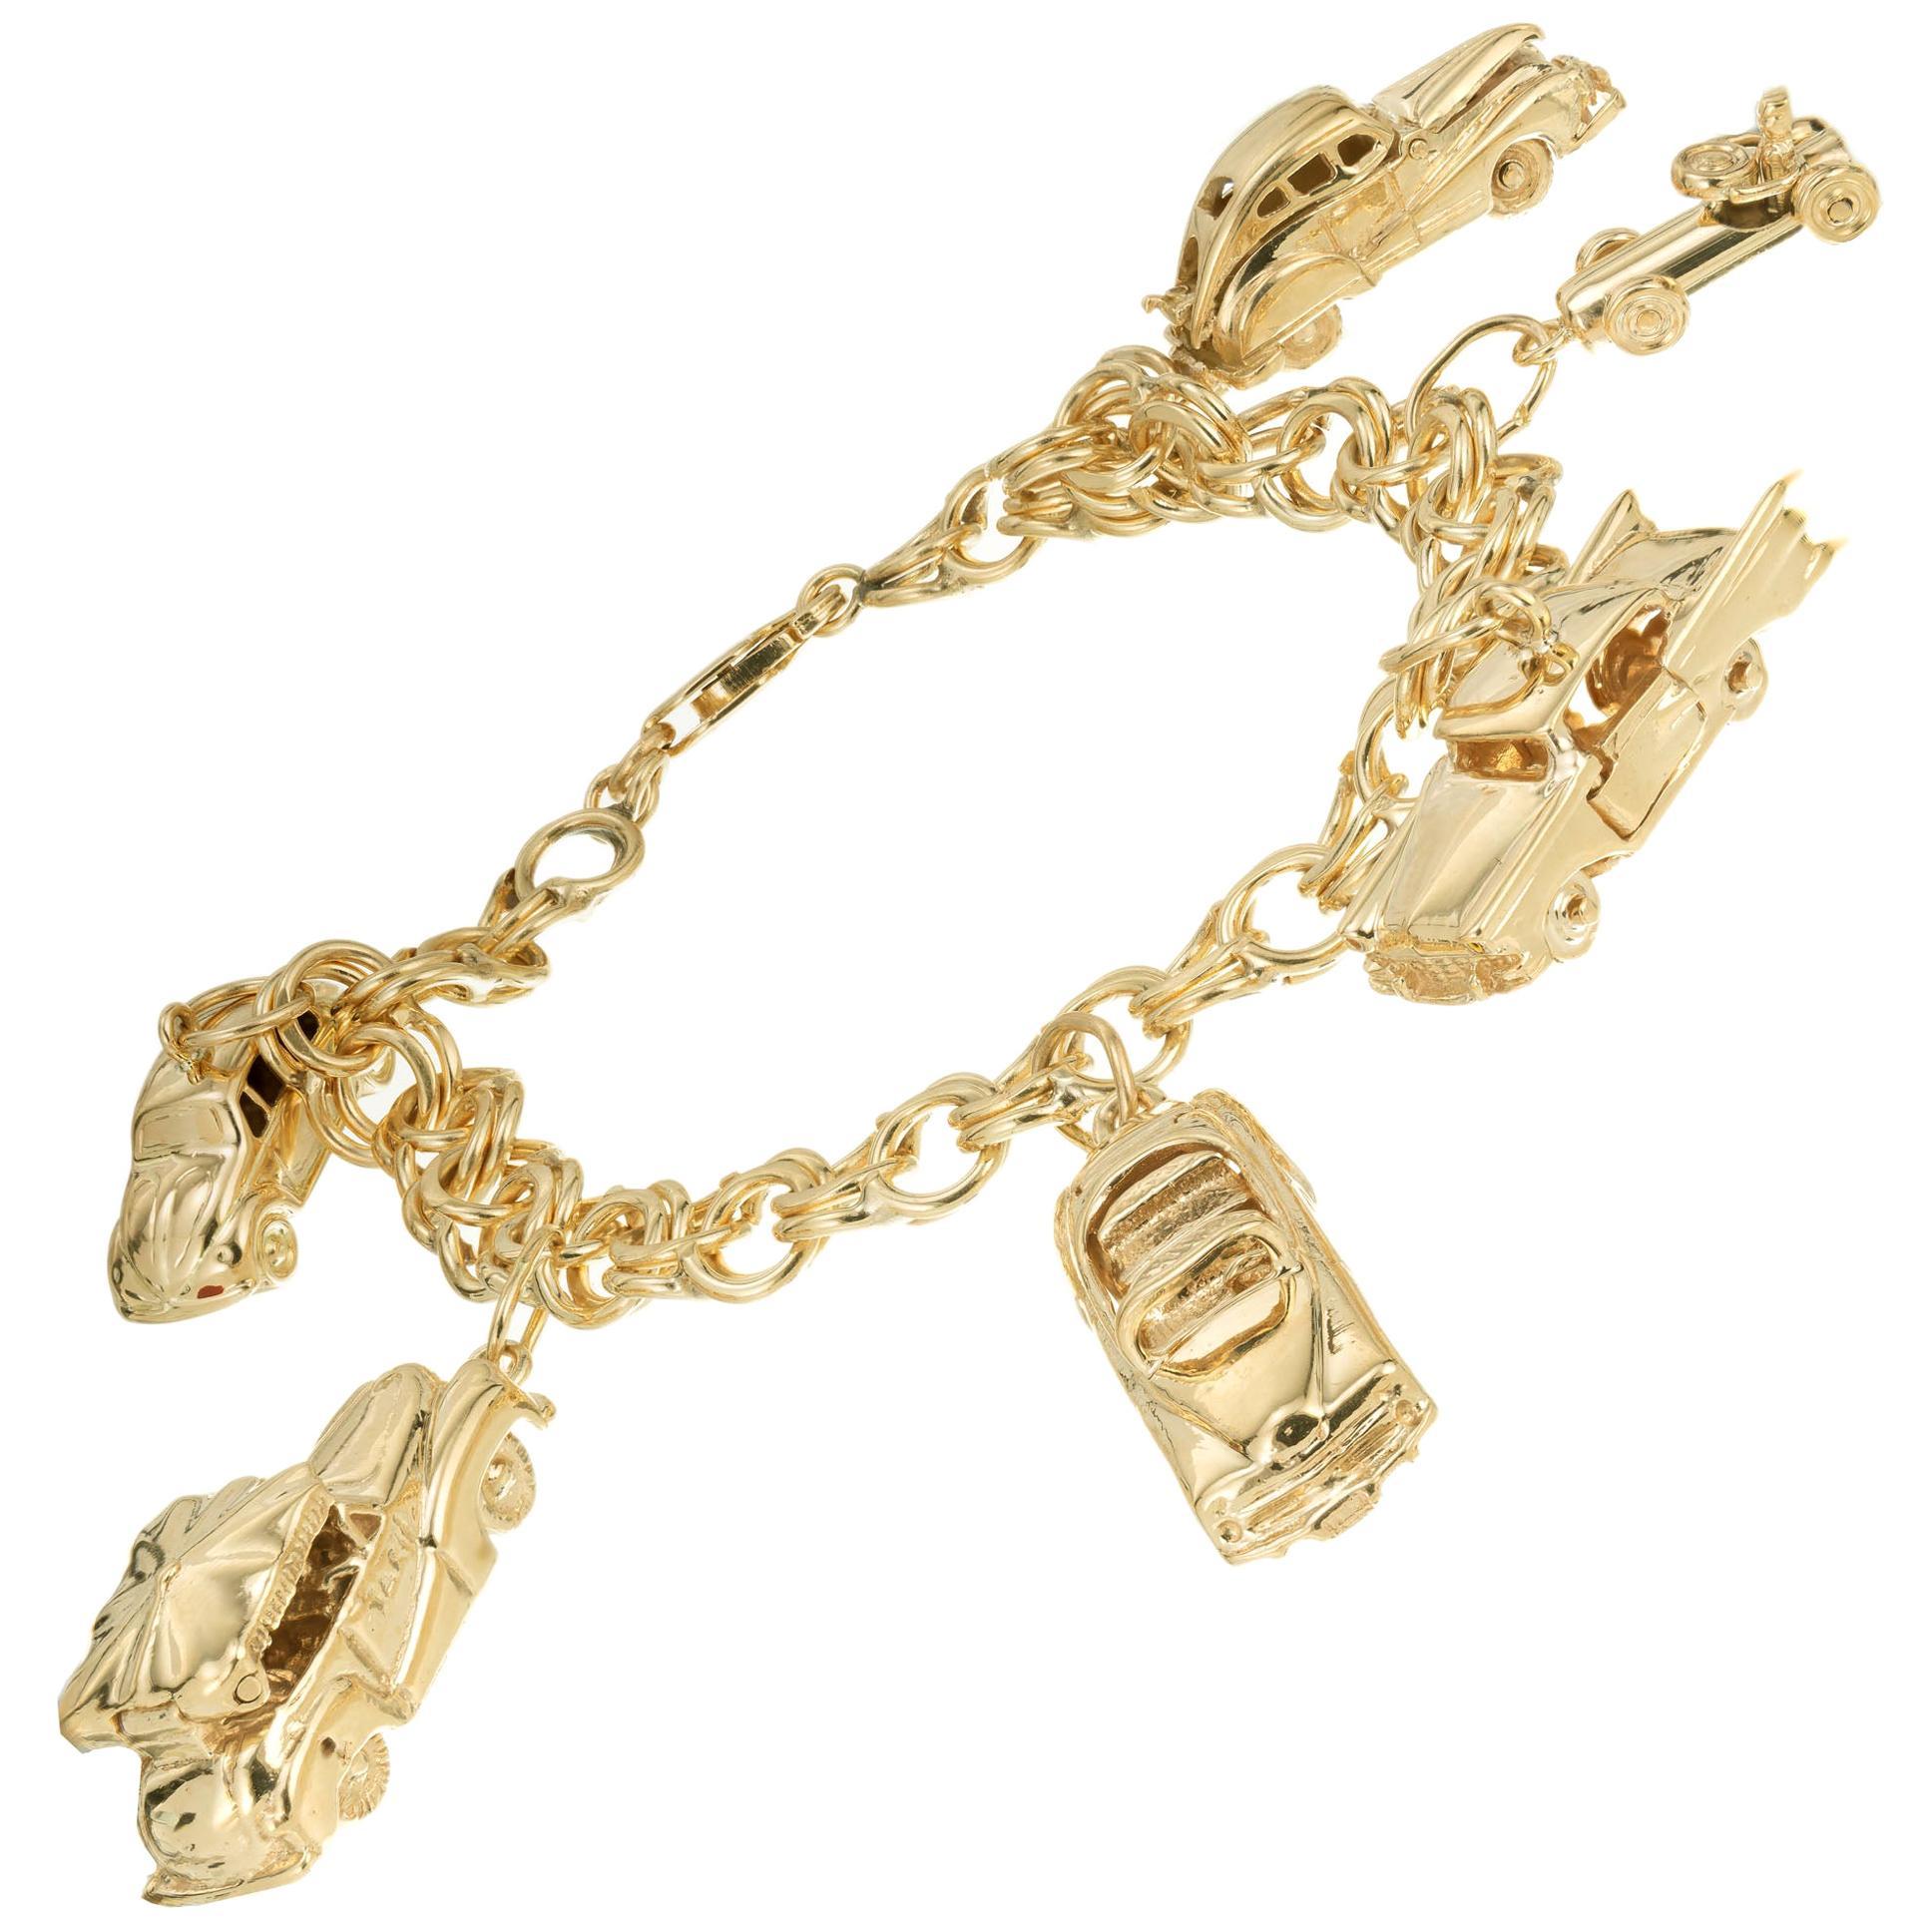 Vintage Yellow Gold Car Themed Charm Bracelet